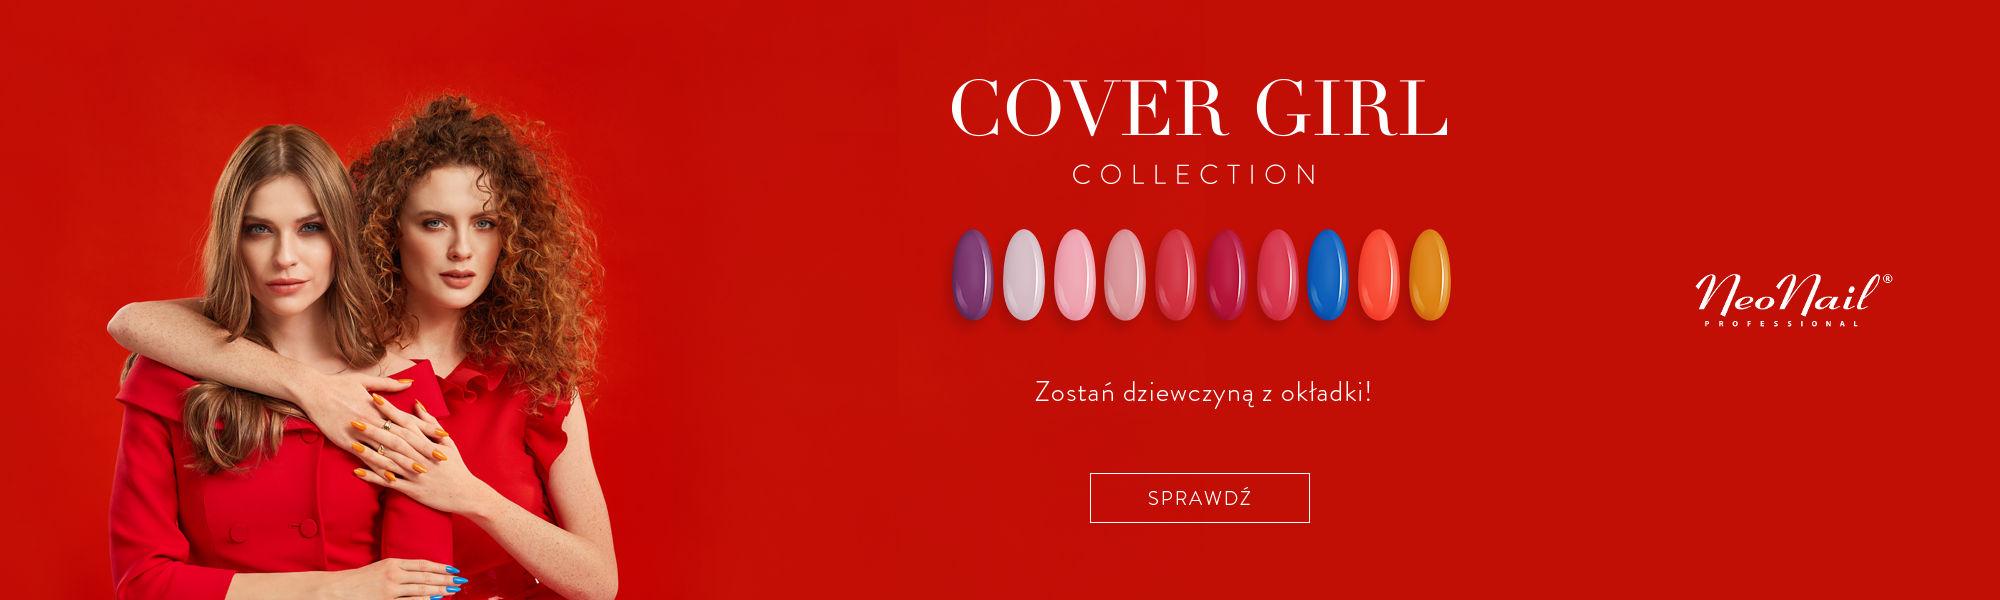 baner-cower-kolekcja-neonail.jpg